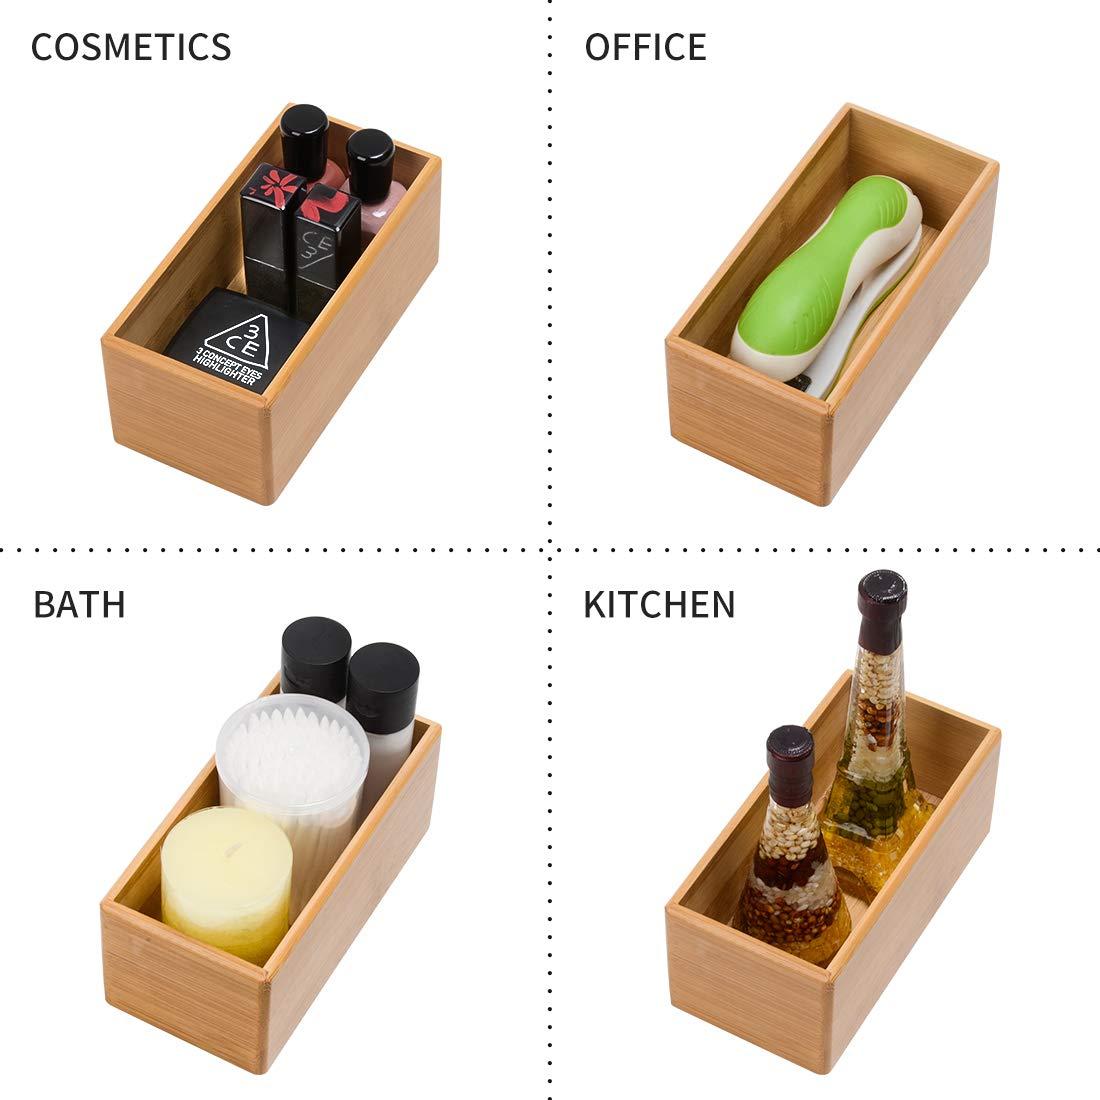 1232.5 Drawer Organizer Storage Box Bathroom Living Room Kitchen Bamboo